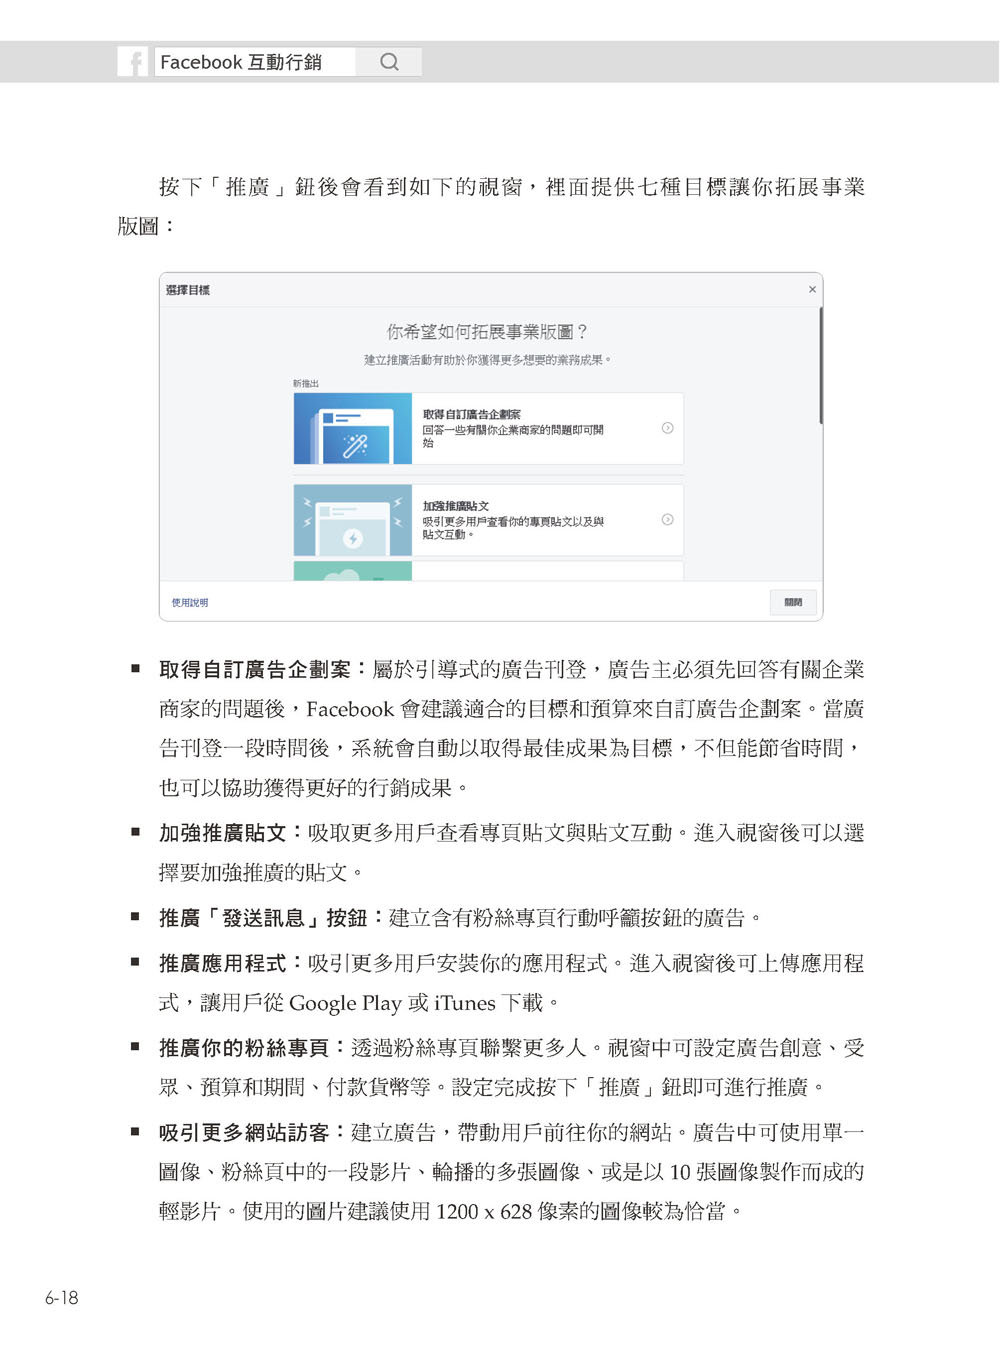 Facebook 互動行銷:社群口碑經營新思路+廣告投放如何有成效,想做好臉書行銷,操作心法就在這!-preview-17